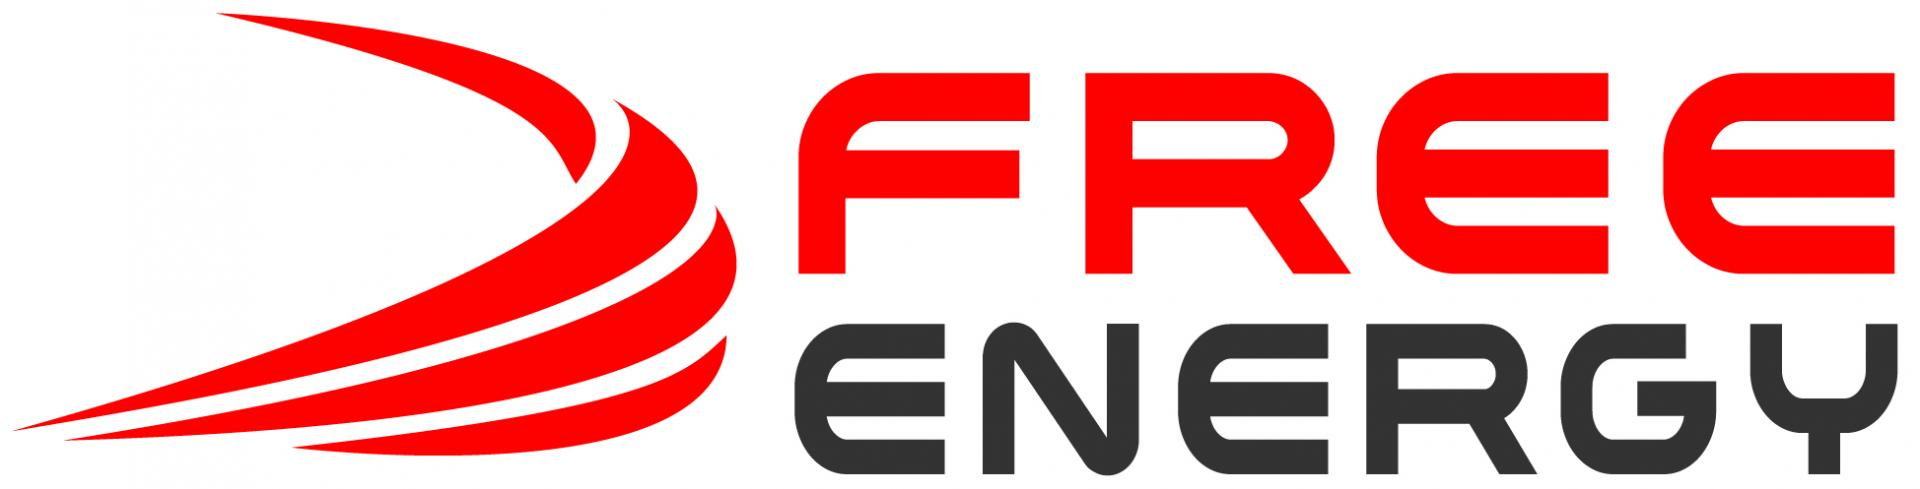 Partenariat FreeEnergy - REUNIPOOL